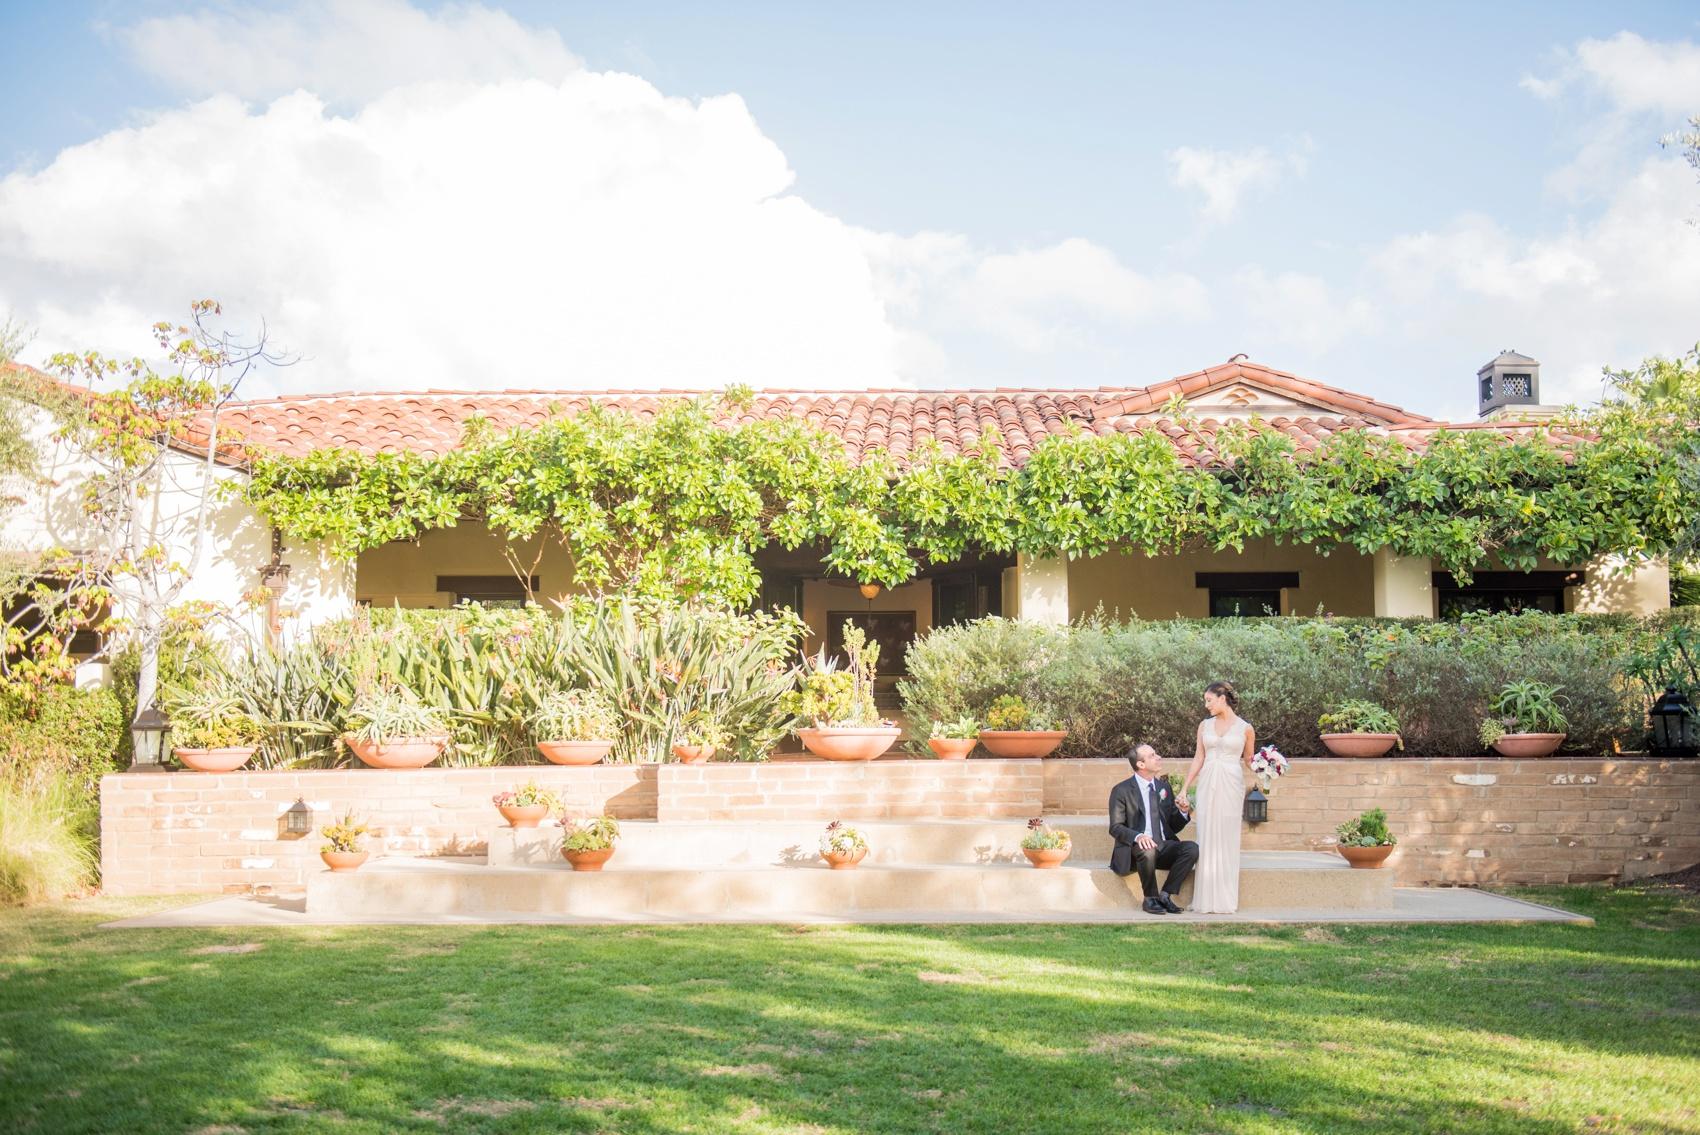 Estancia La Jolla wedding photos by Mikkel Paige Photography.